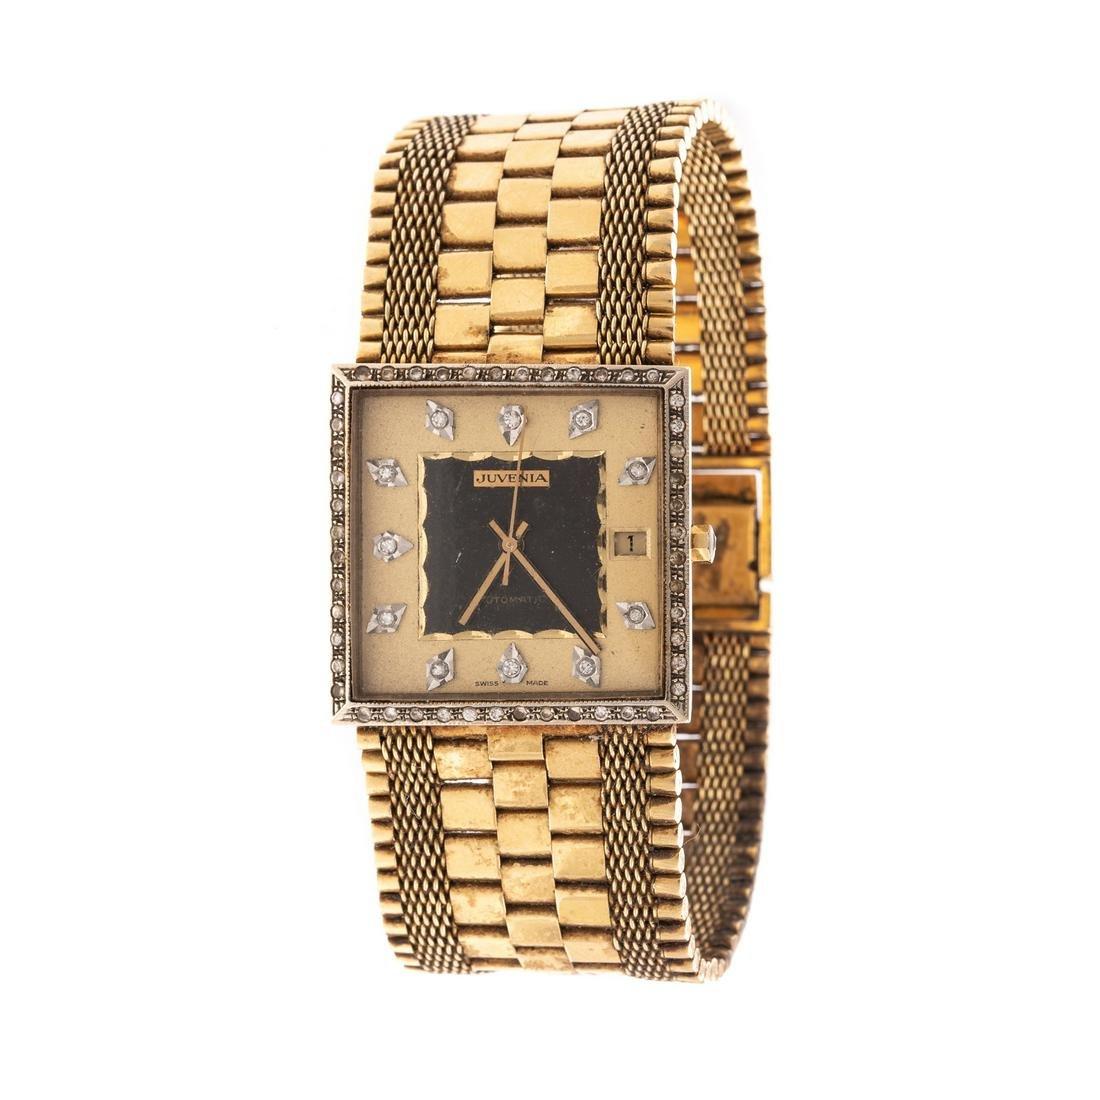 A Vintage Juvenia 18K Diamond Wrist Watch